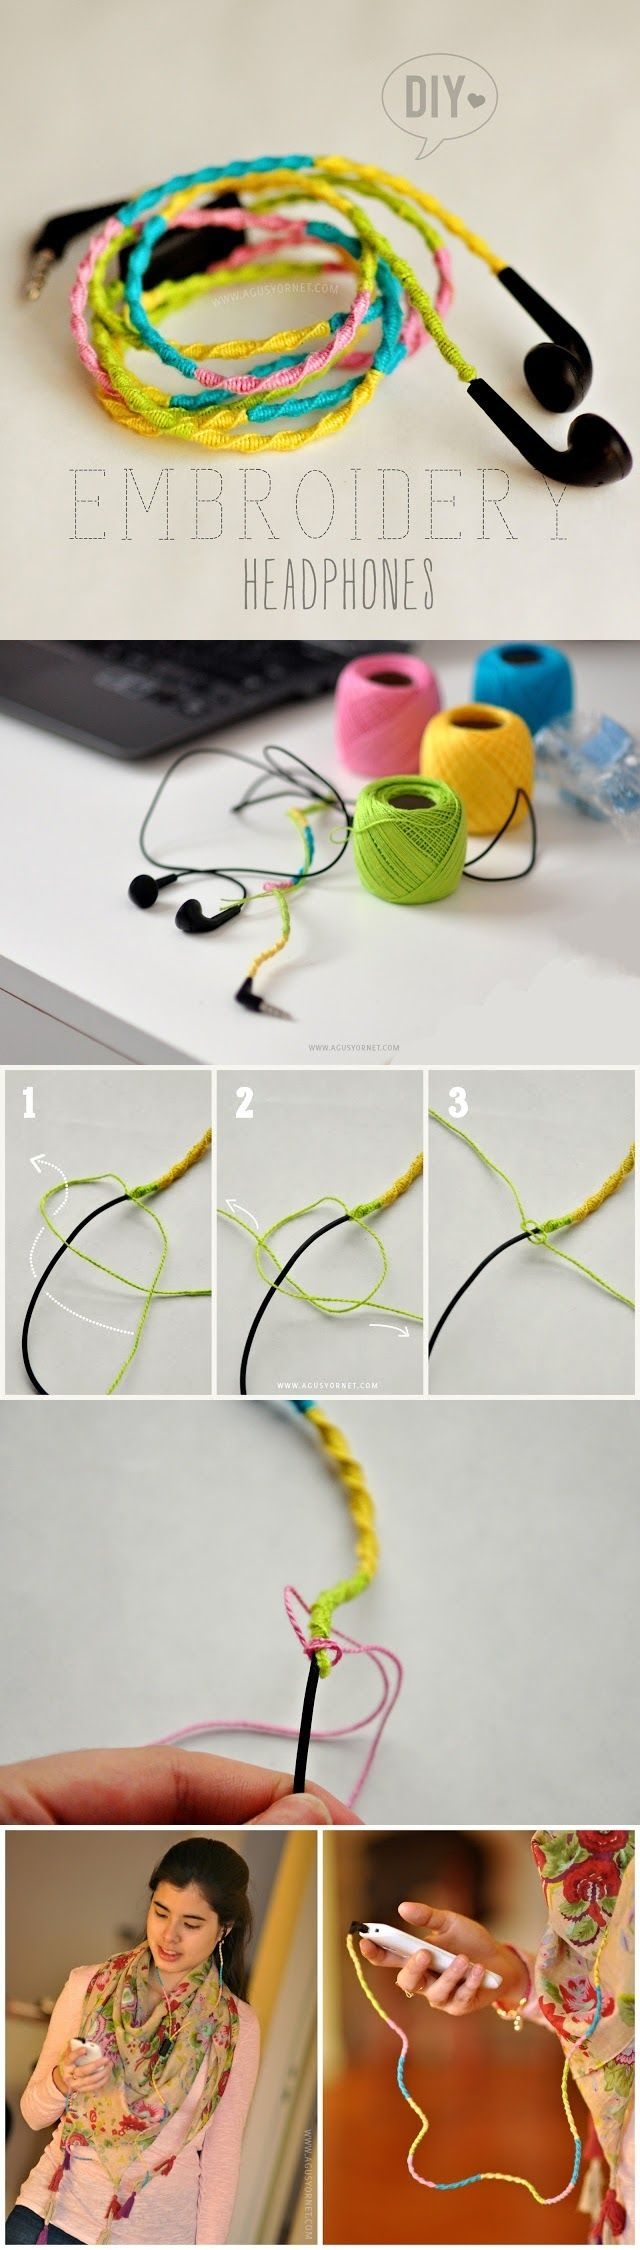 DIY Embroidery Headphones